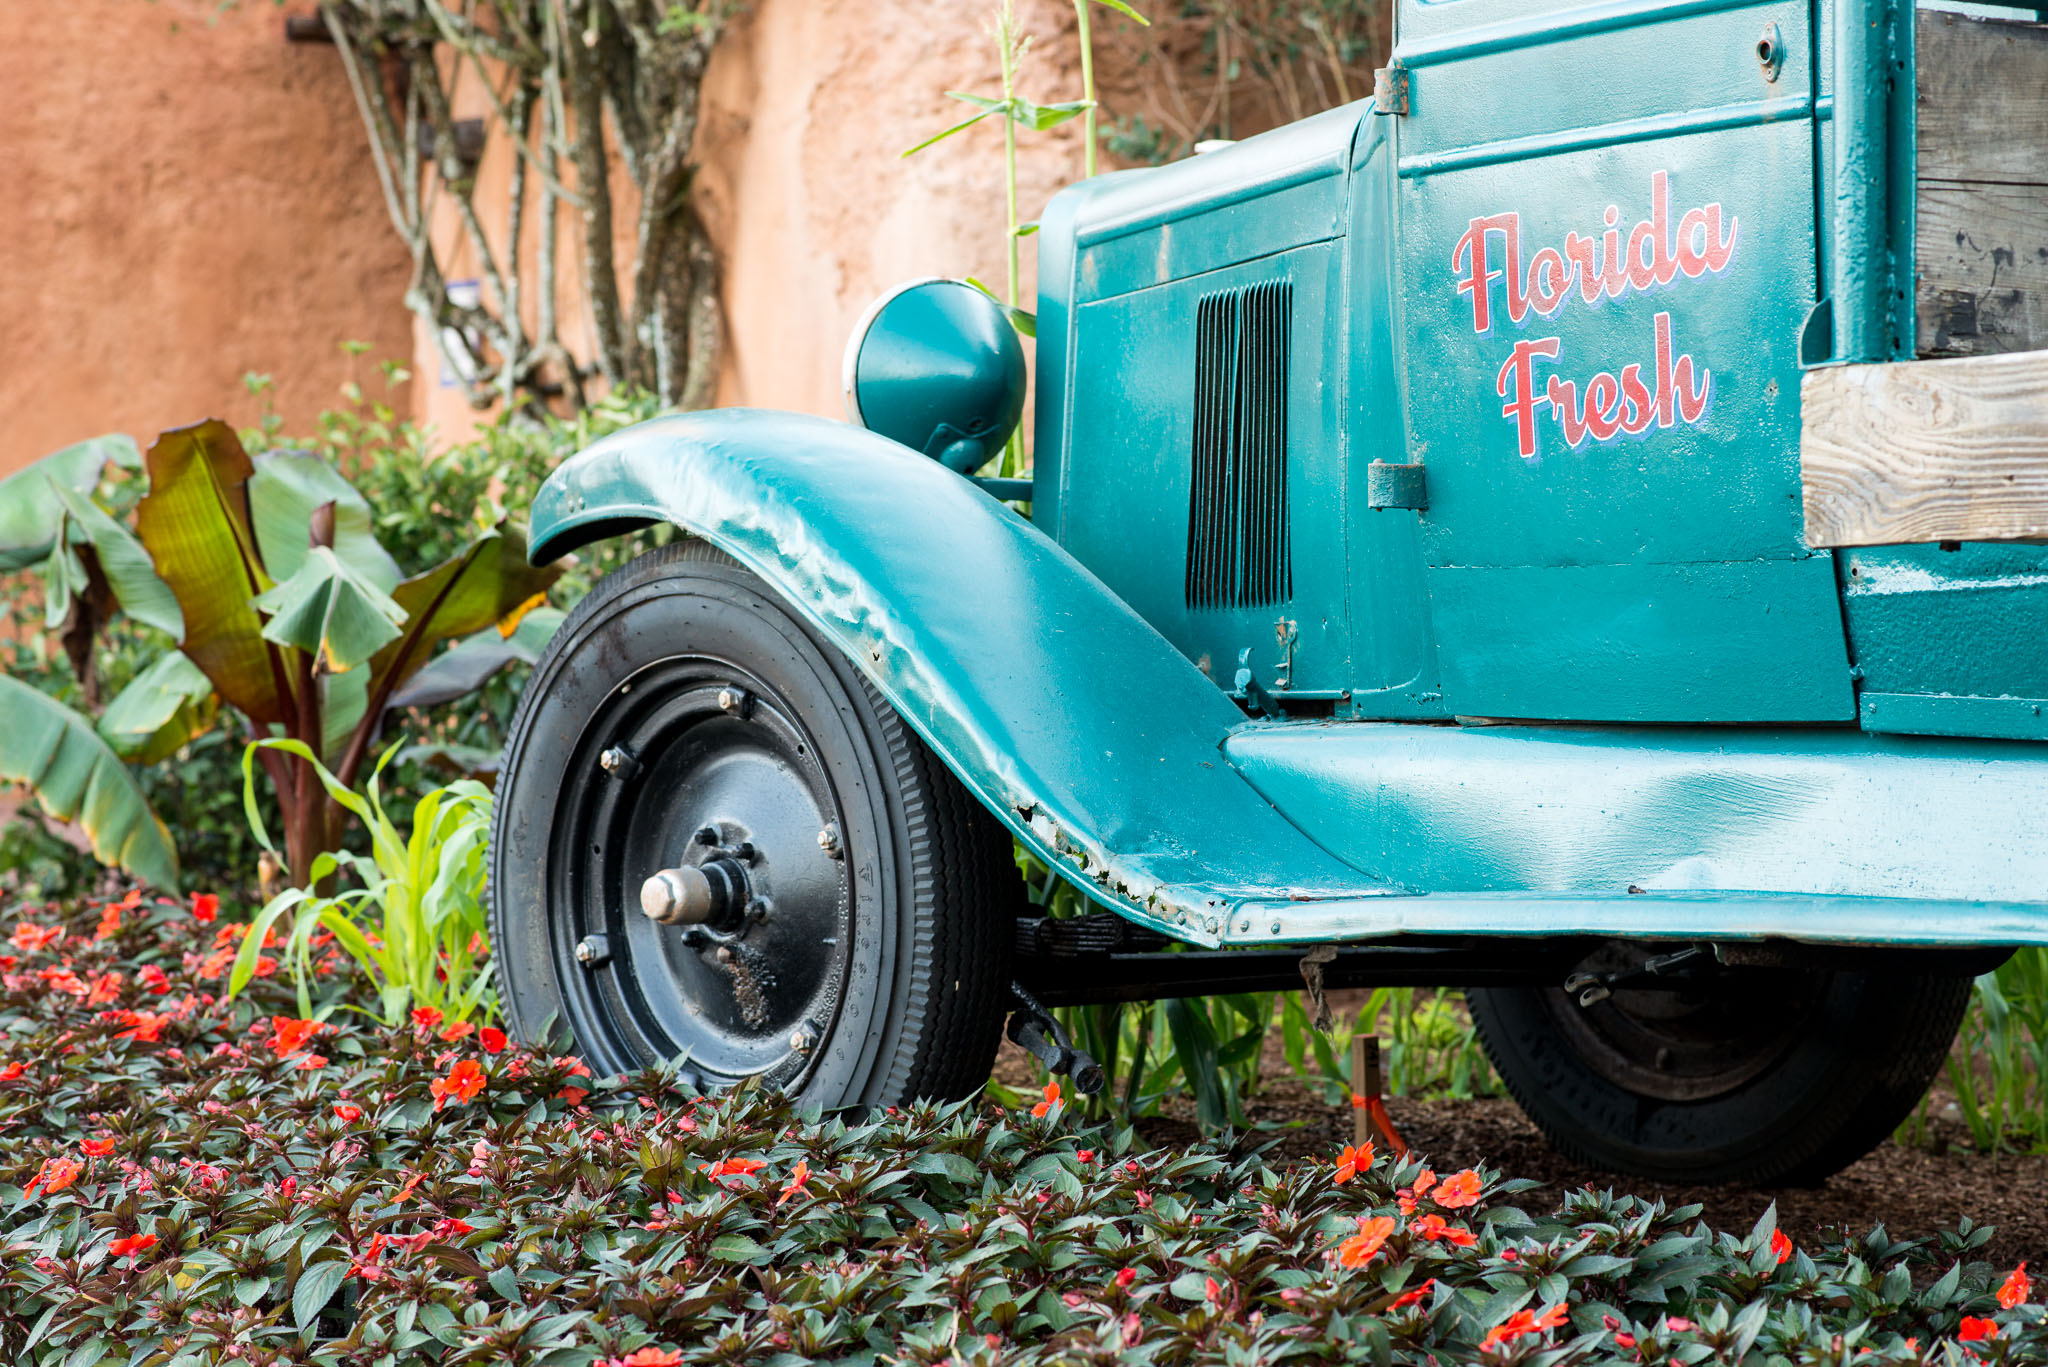 Florid Fresh Truck Cab - Epcot Flower & Garden Festival 2016